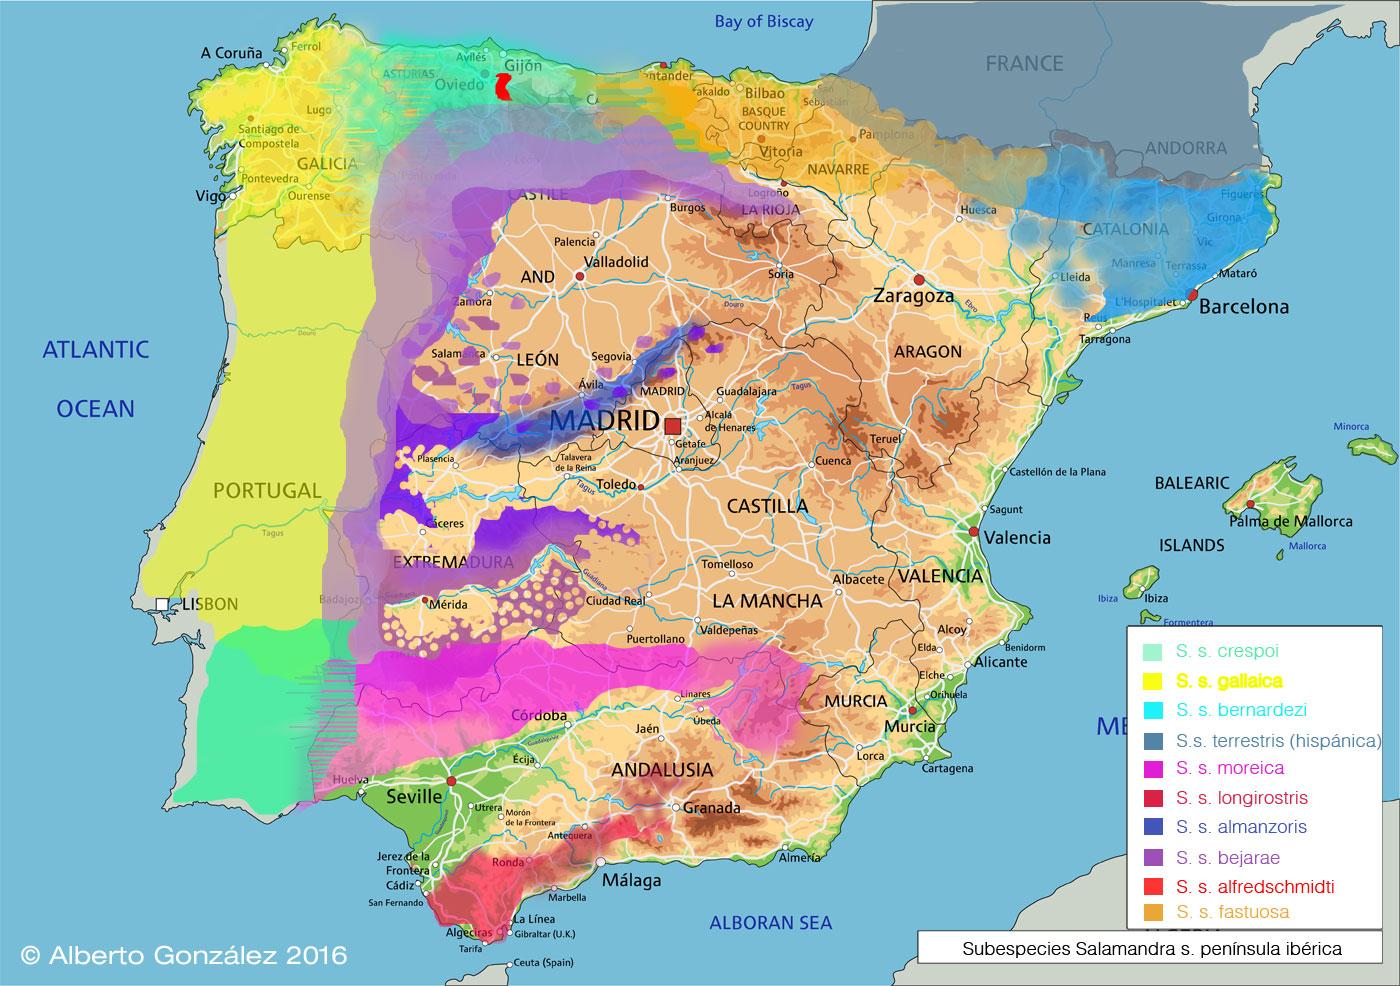 subespecies-de-salamandra-españa-peninsula-iberica